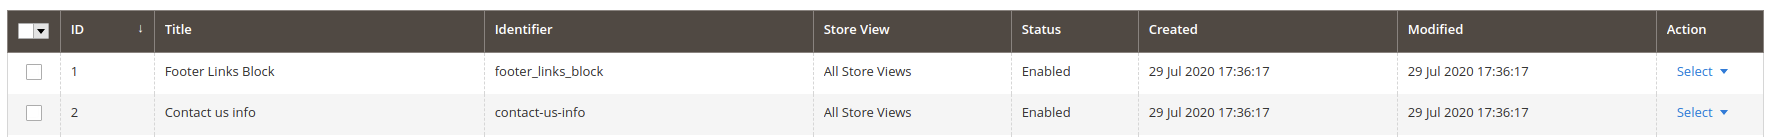 Magento CMS blocks listing, with identifier column